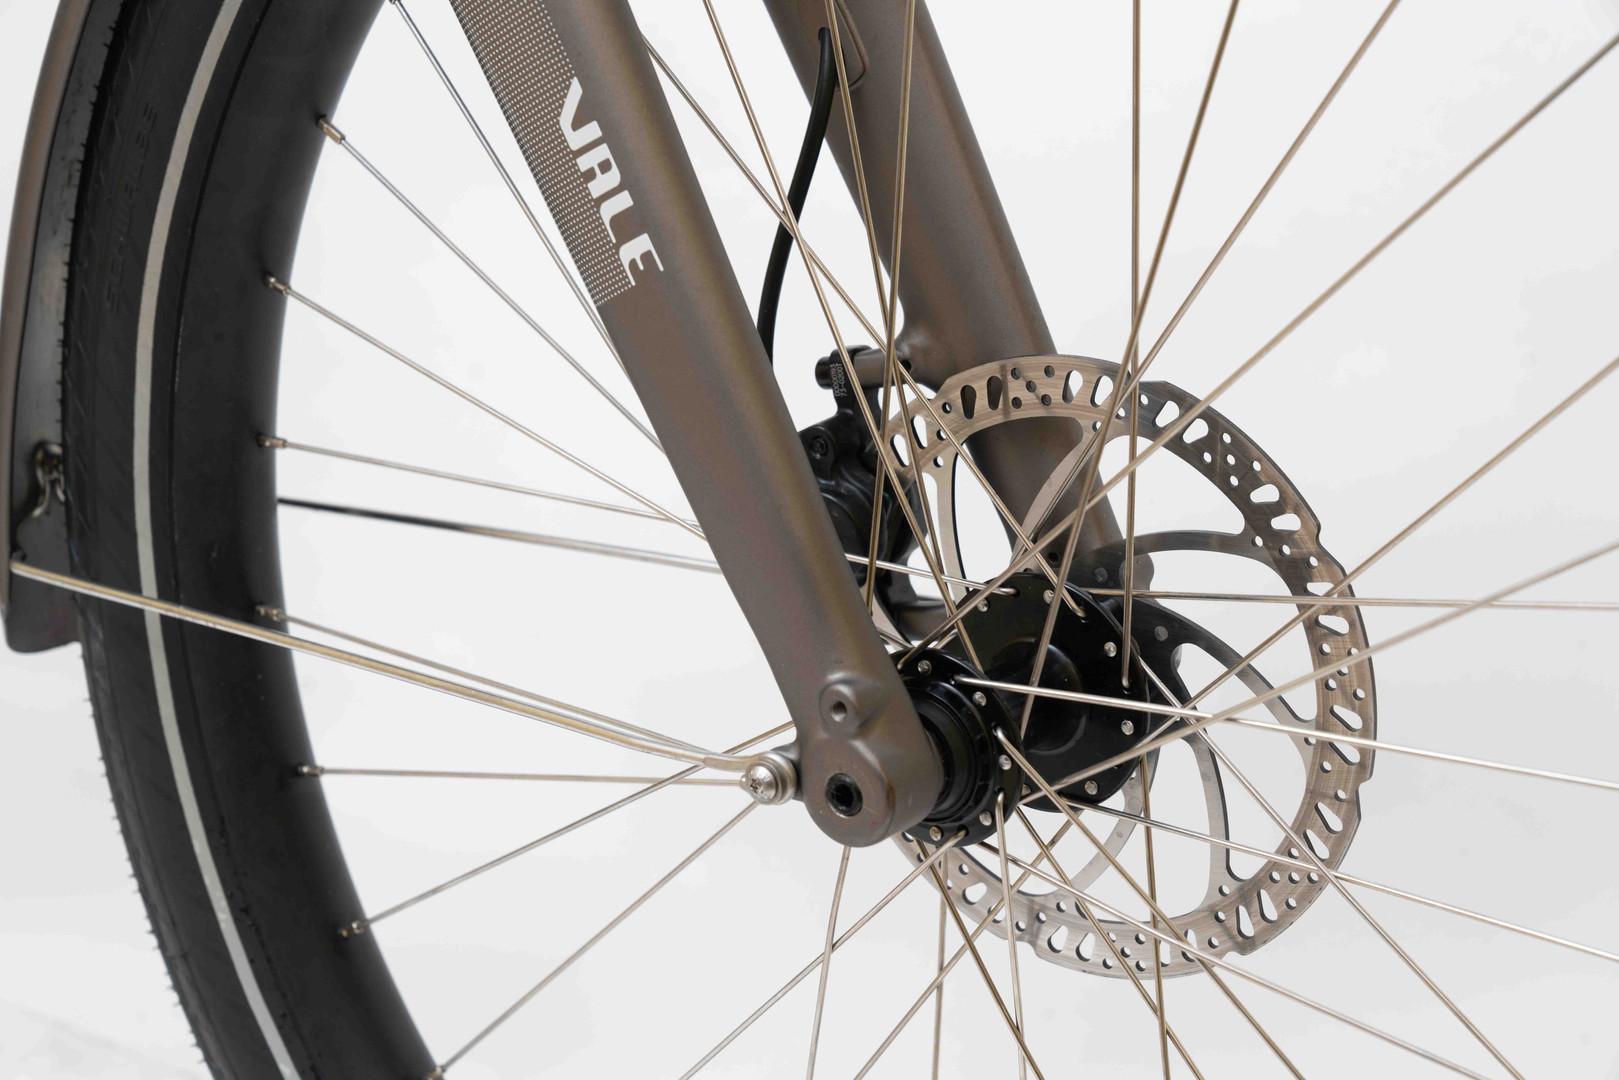 Fahrradladen_Pforzheim_Simoes_Bikes_104.